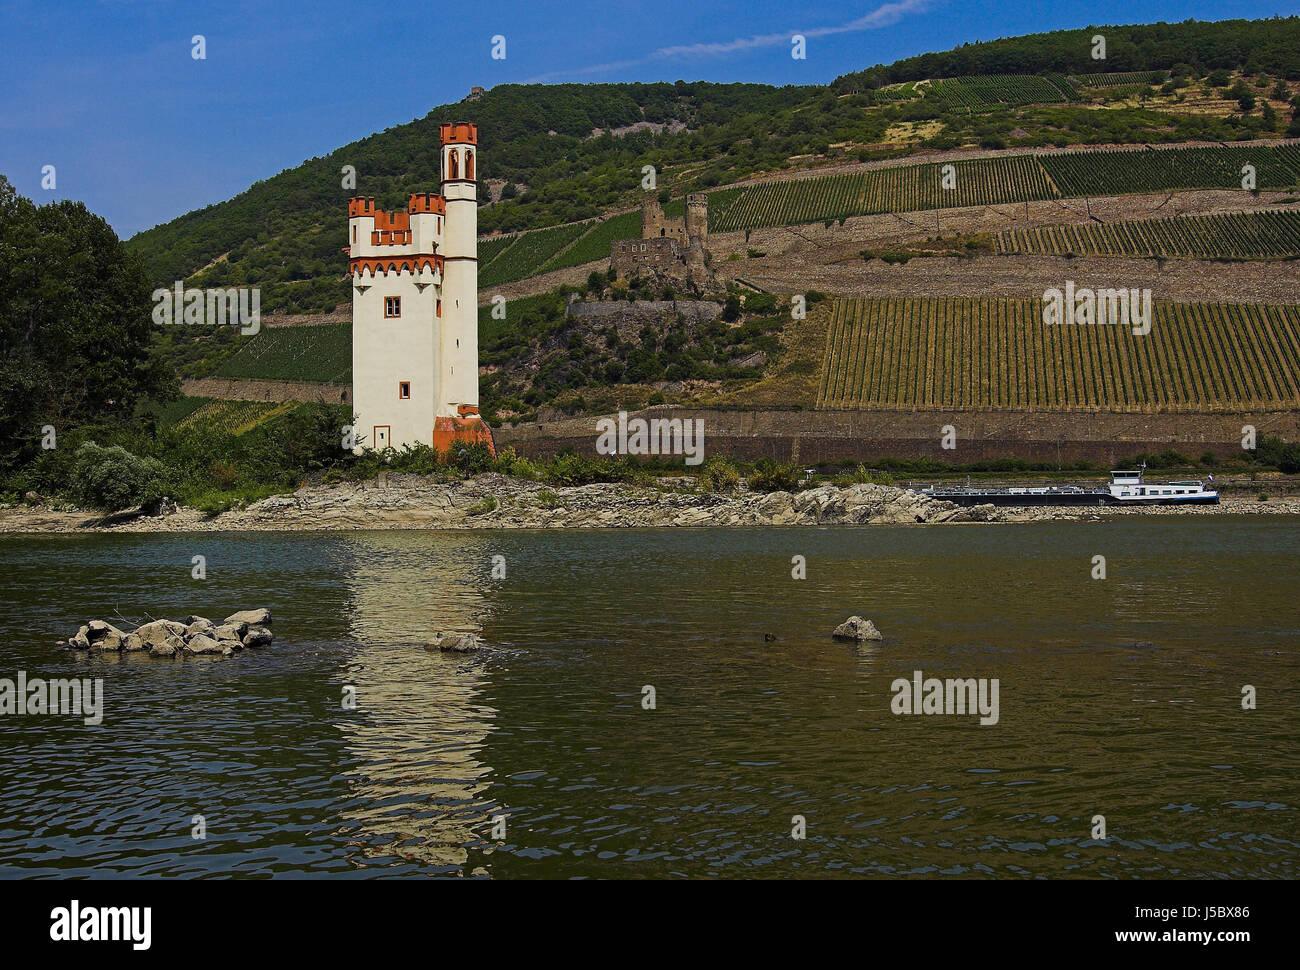 tower rhine ruins myth saw isle island chateau castle middle ages museturm - Stock Image